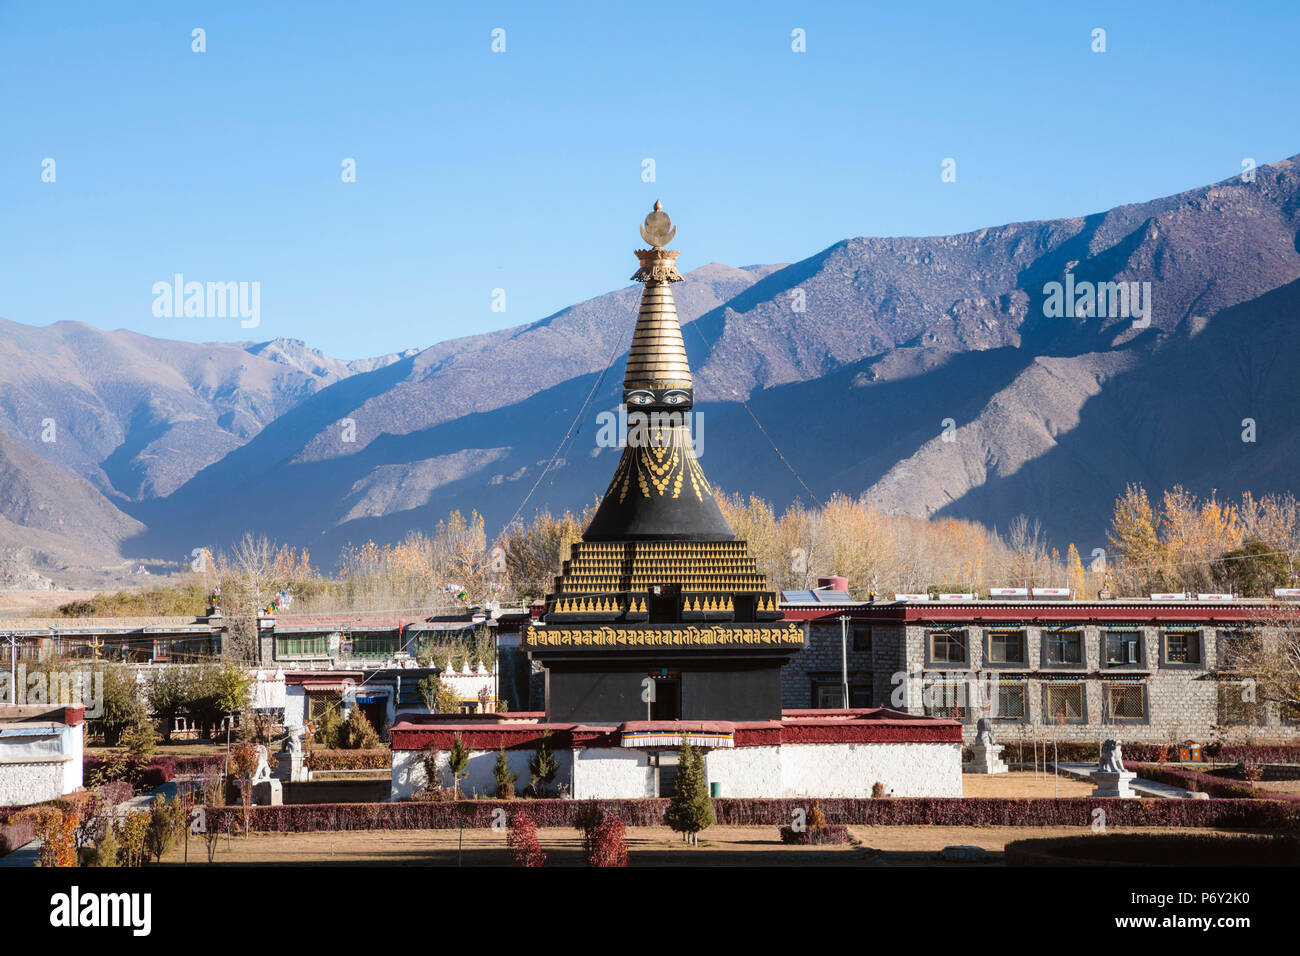 Monastero di Samye, Tibet, Cina Immagini Stock